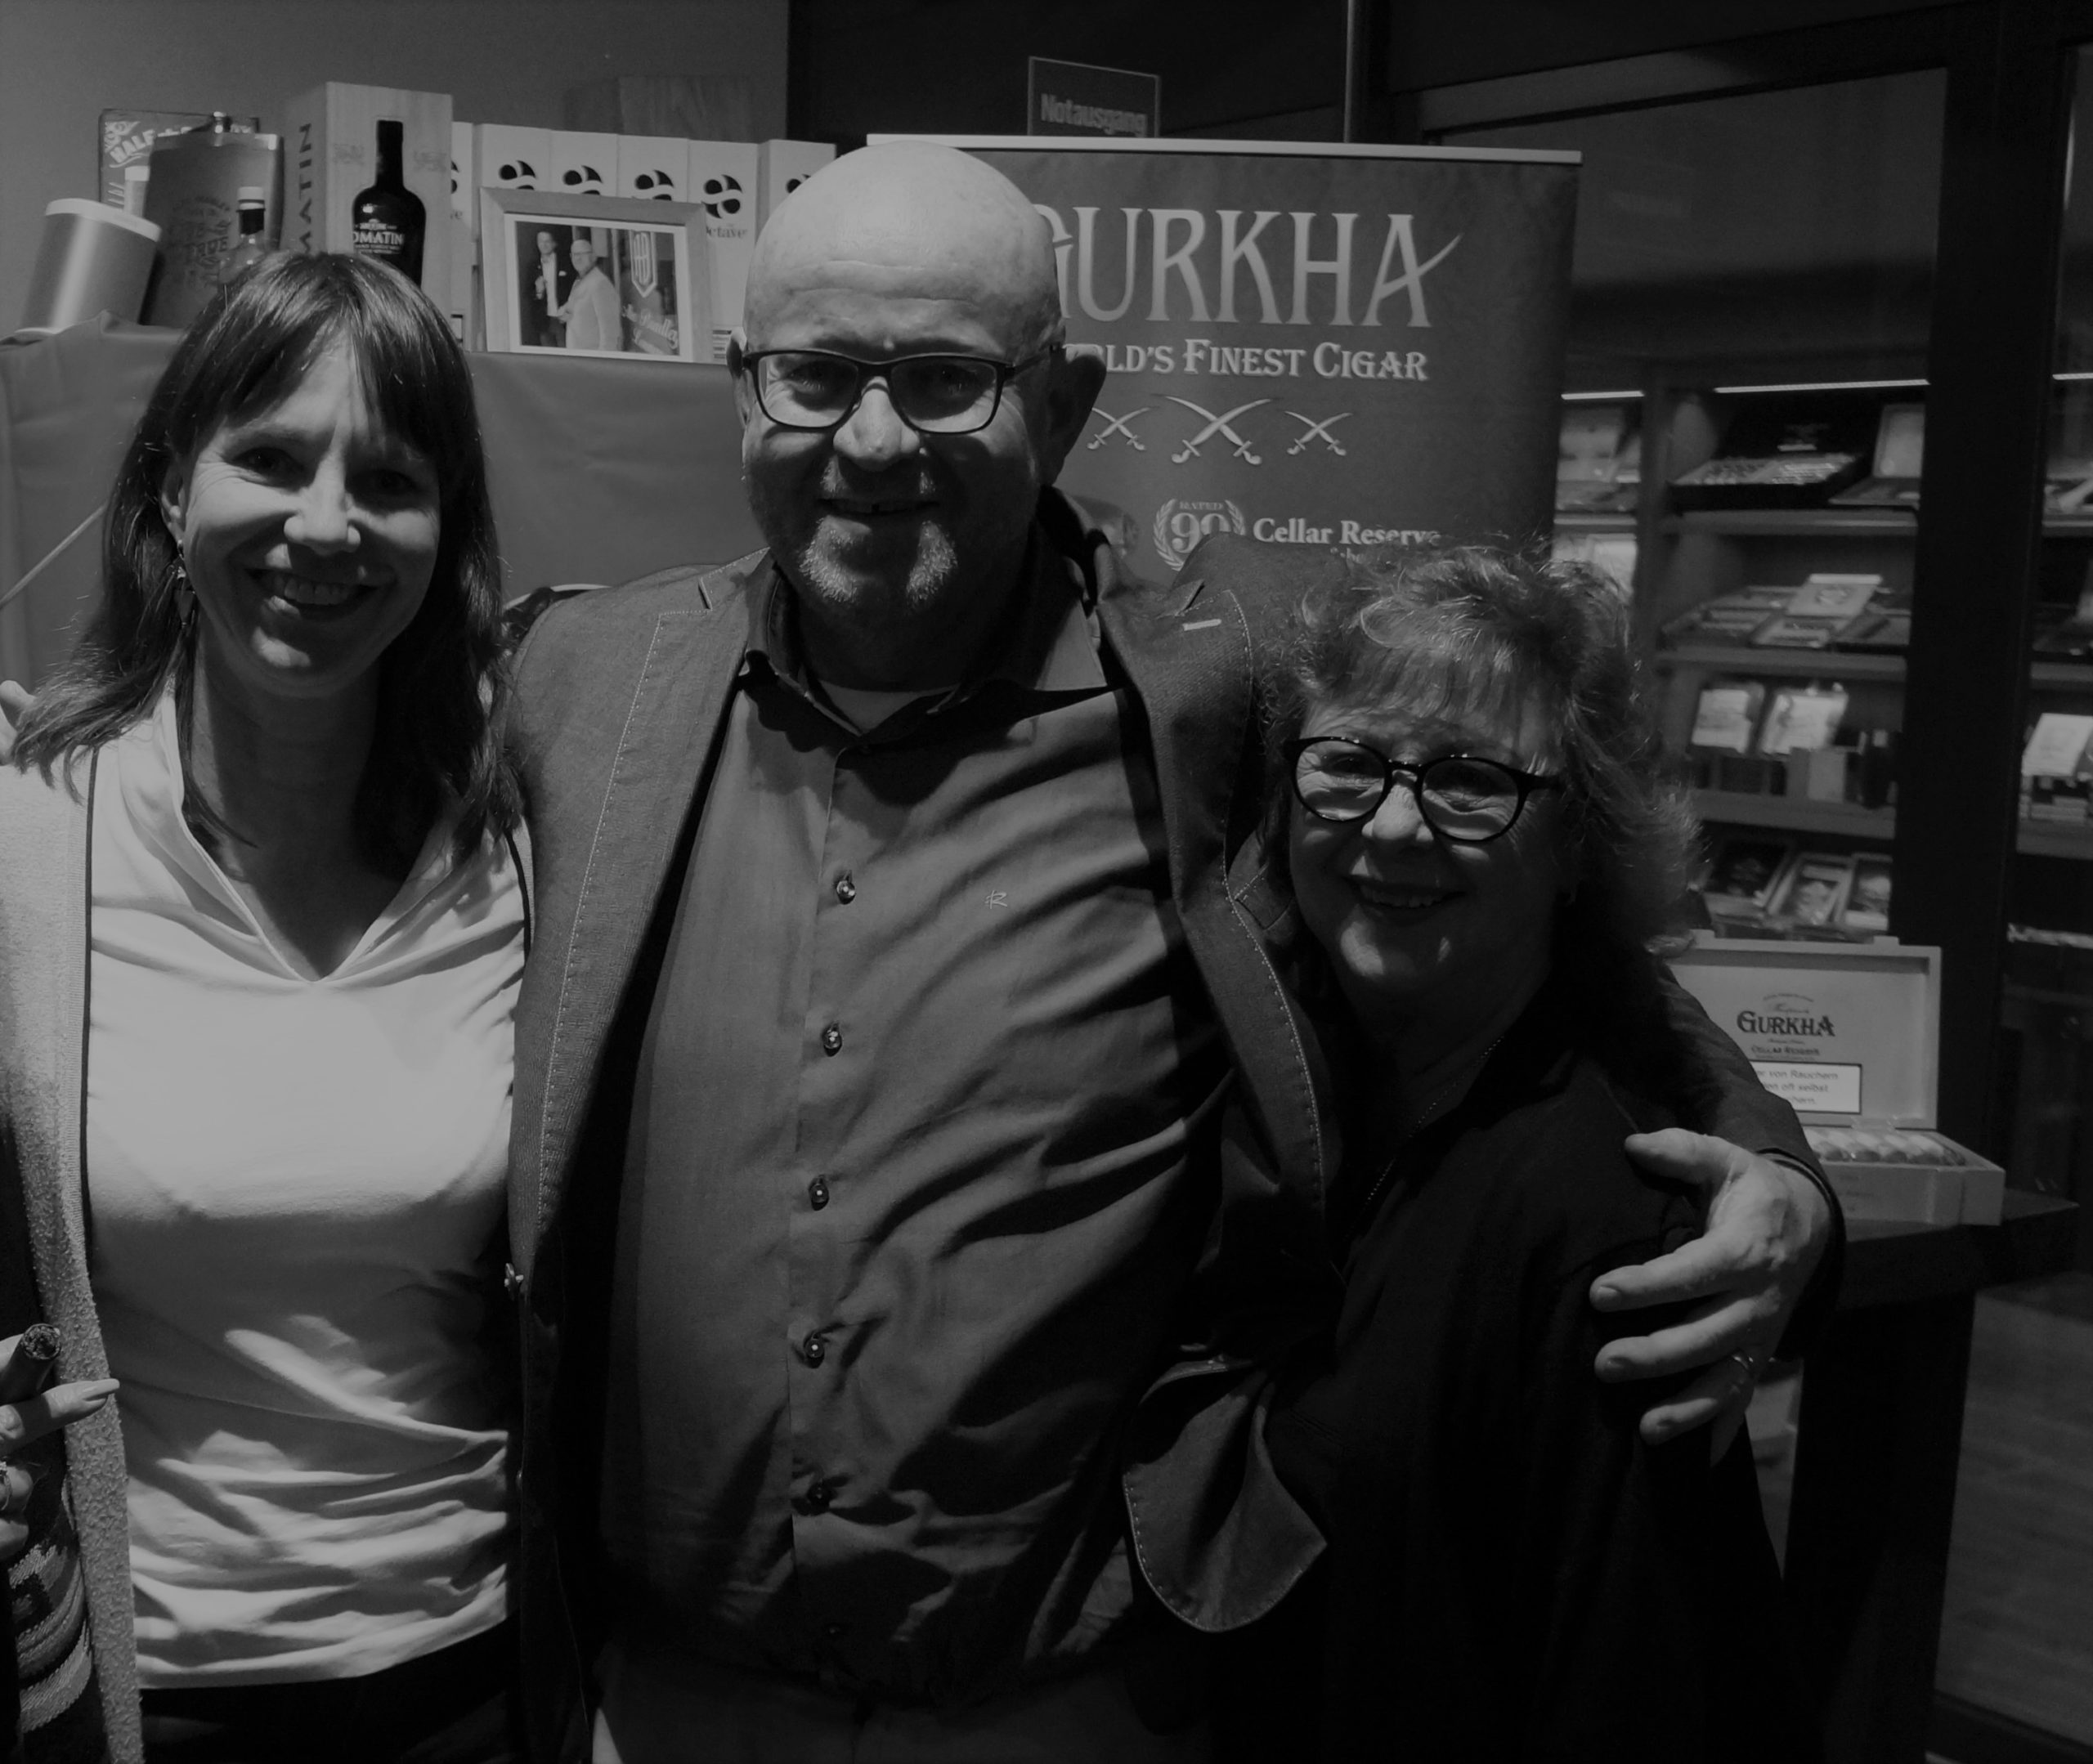 Cristina Santana von Gurkha Cigars bei Han Hilderink und Claudia Eilers im whisky & cigar salon